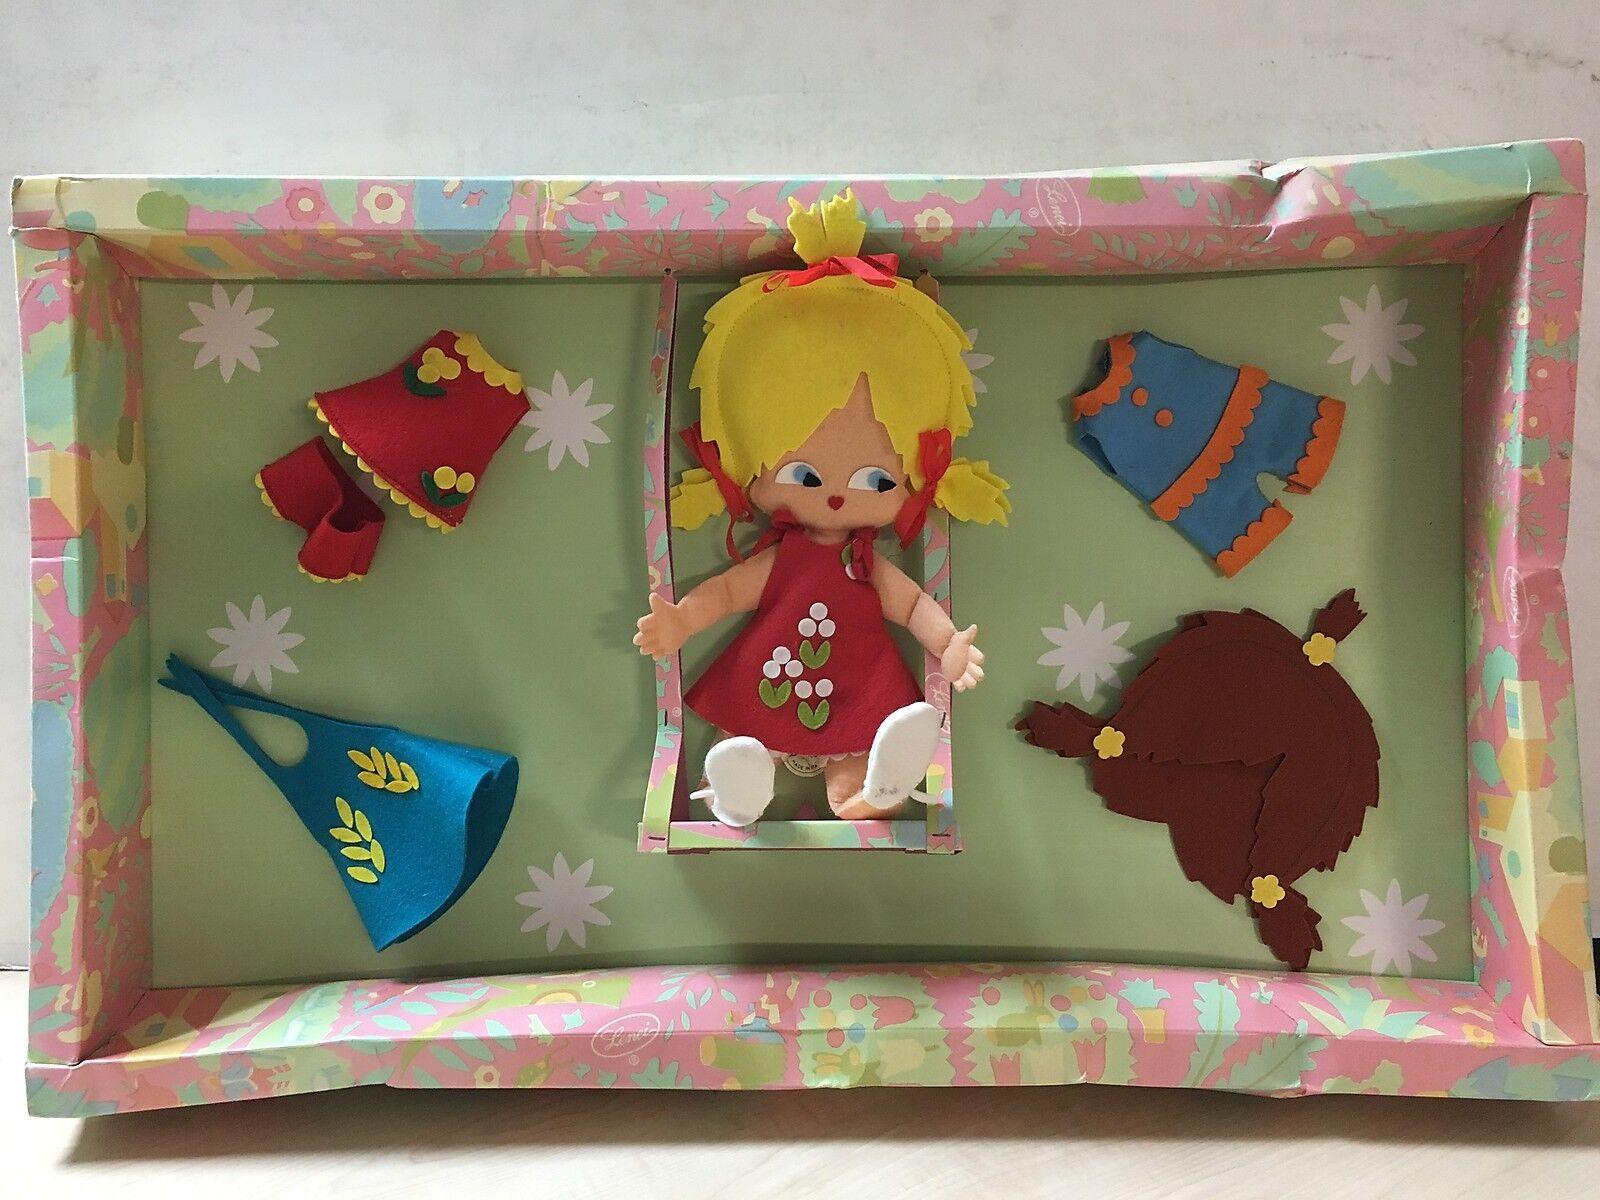 67118 Bambola di panno Vintage con scatola originale - Lenci